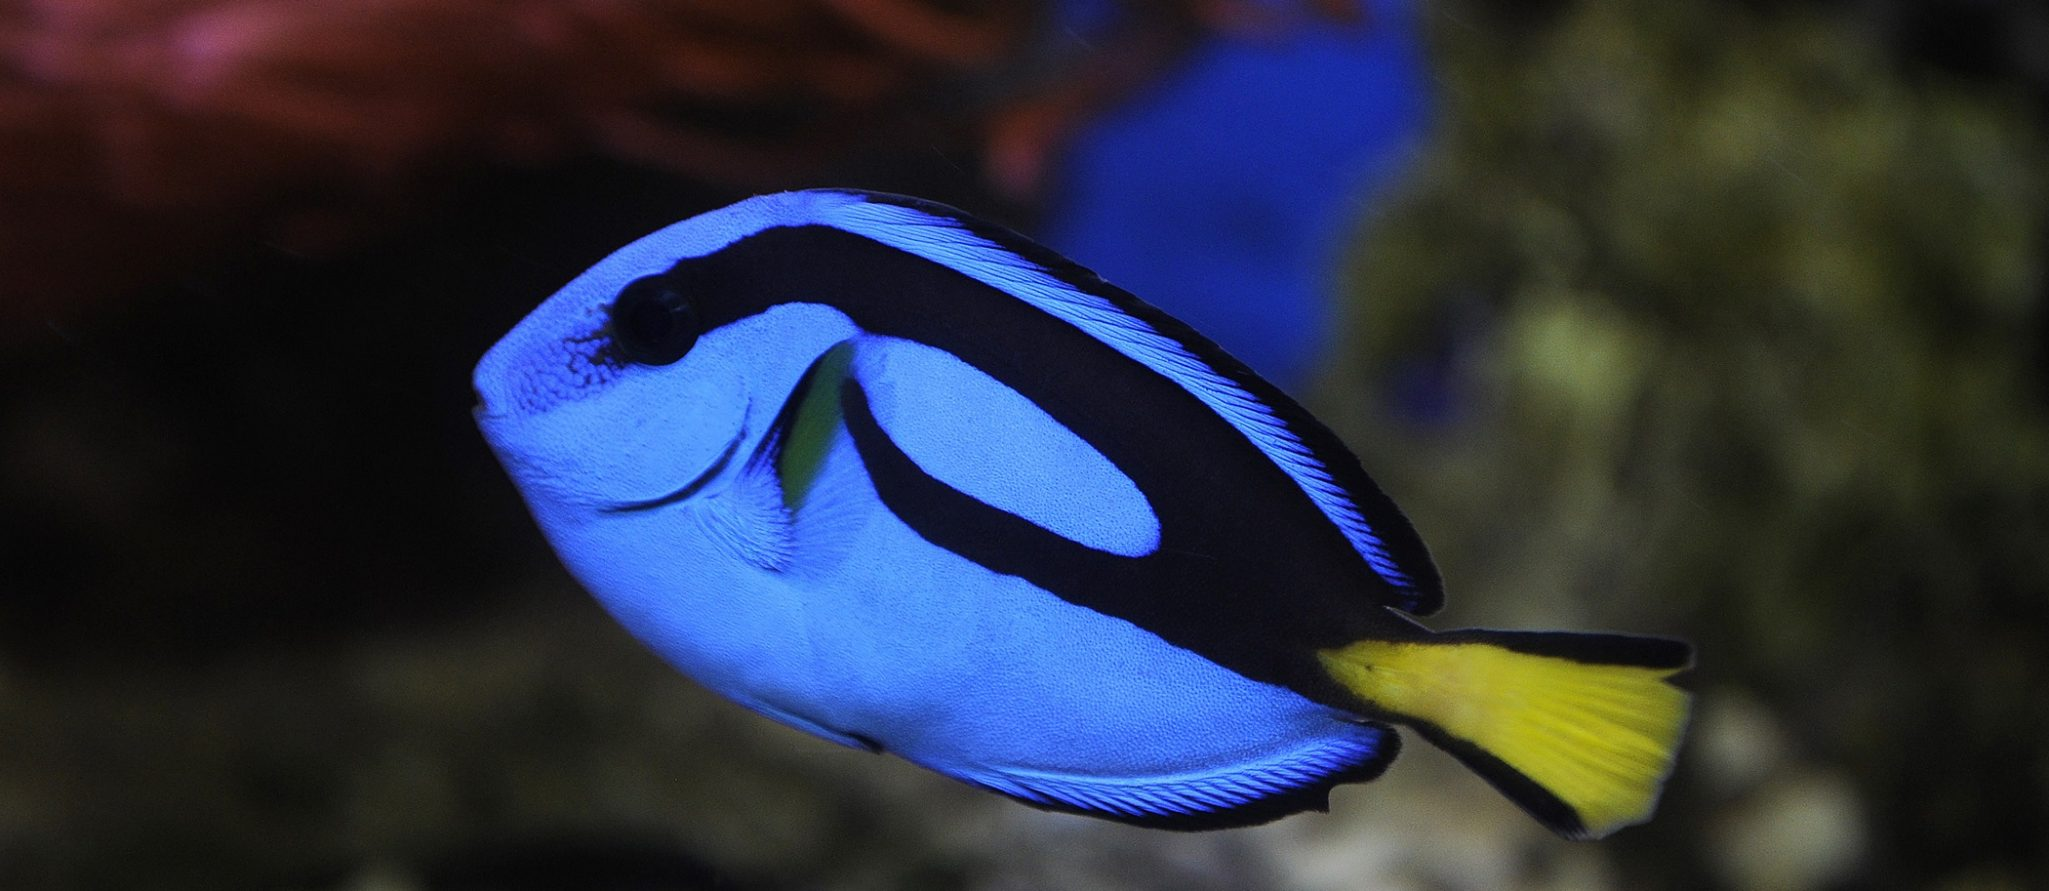 surgeonfish, picasso-doktersvis, Paracanthurus hepatus